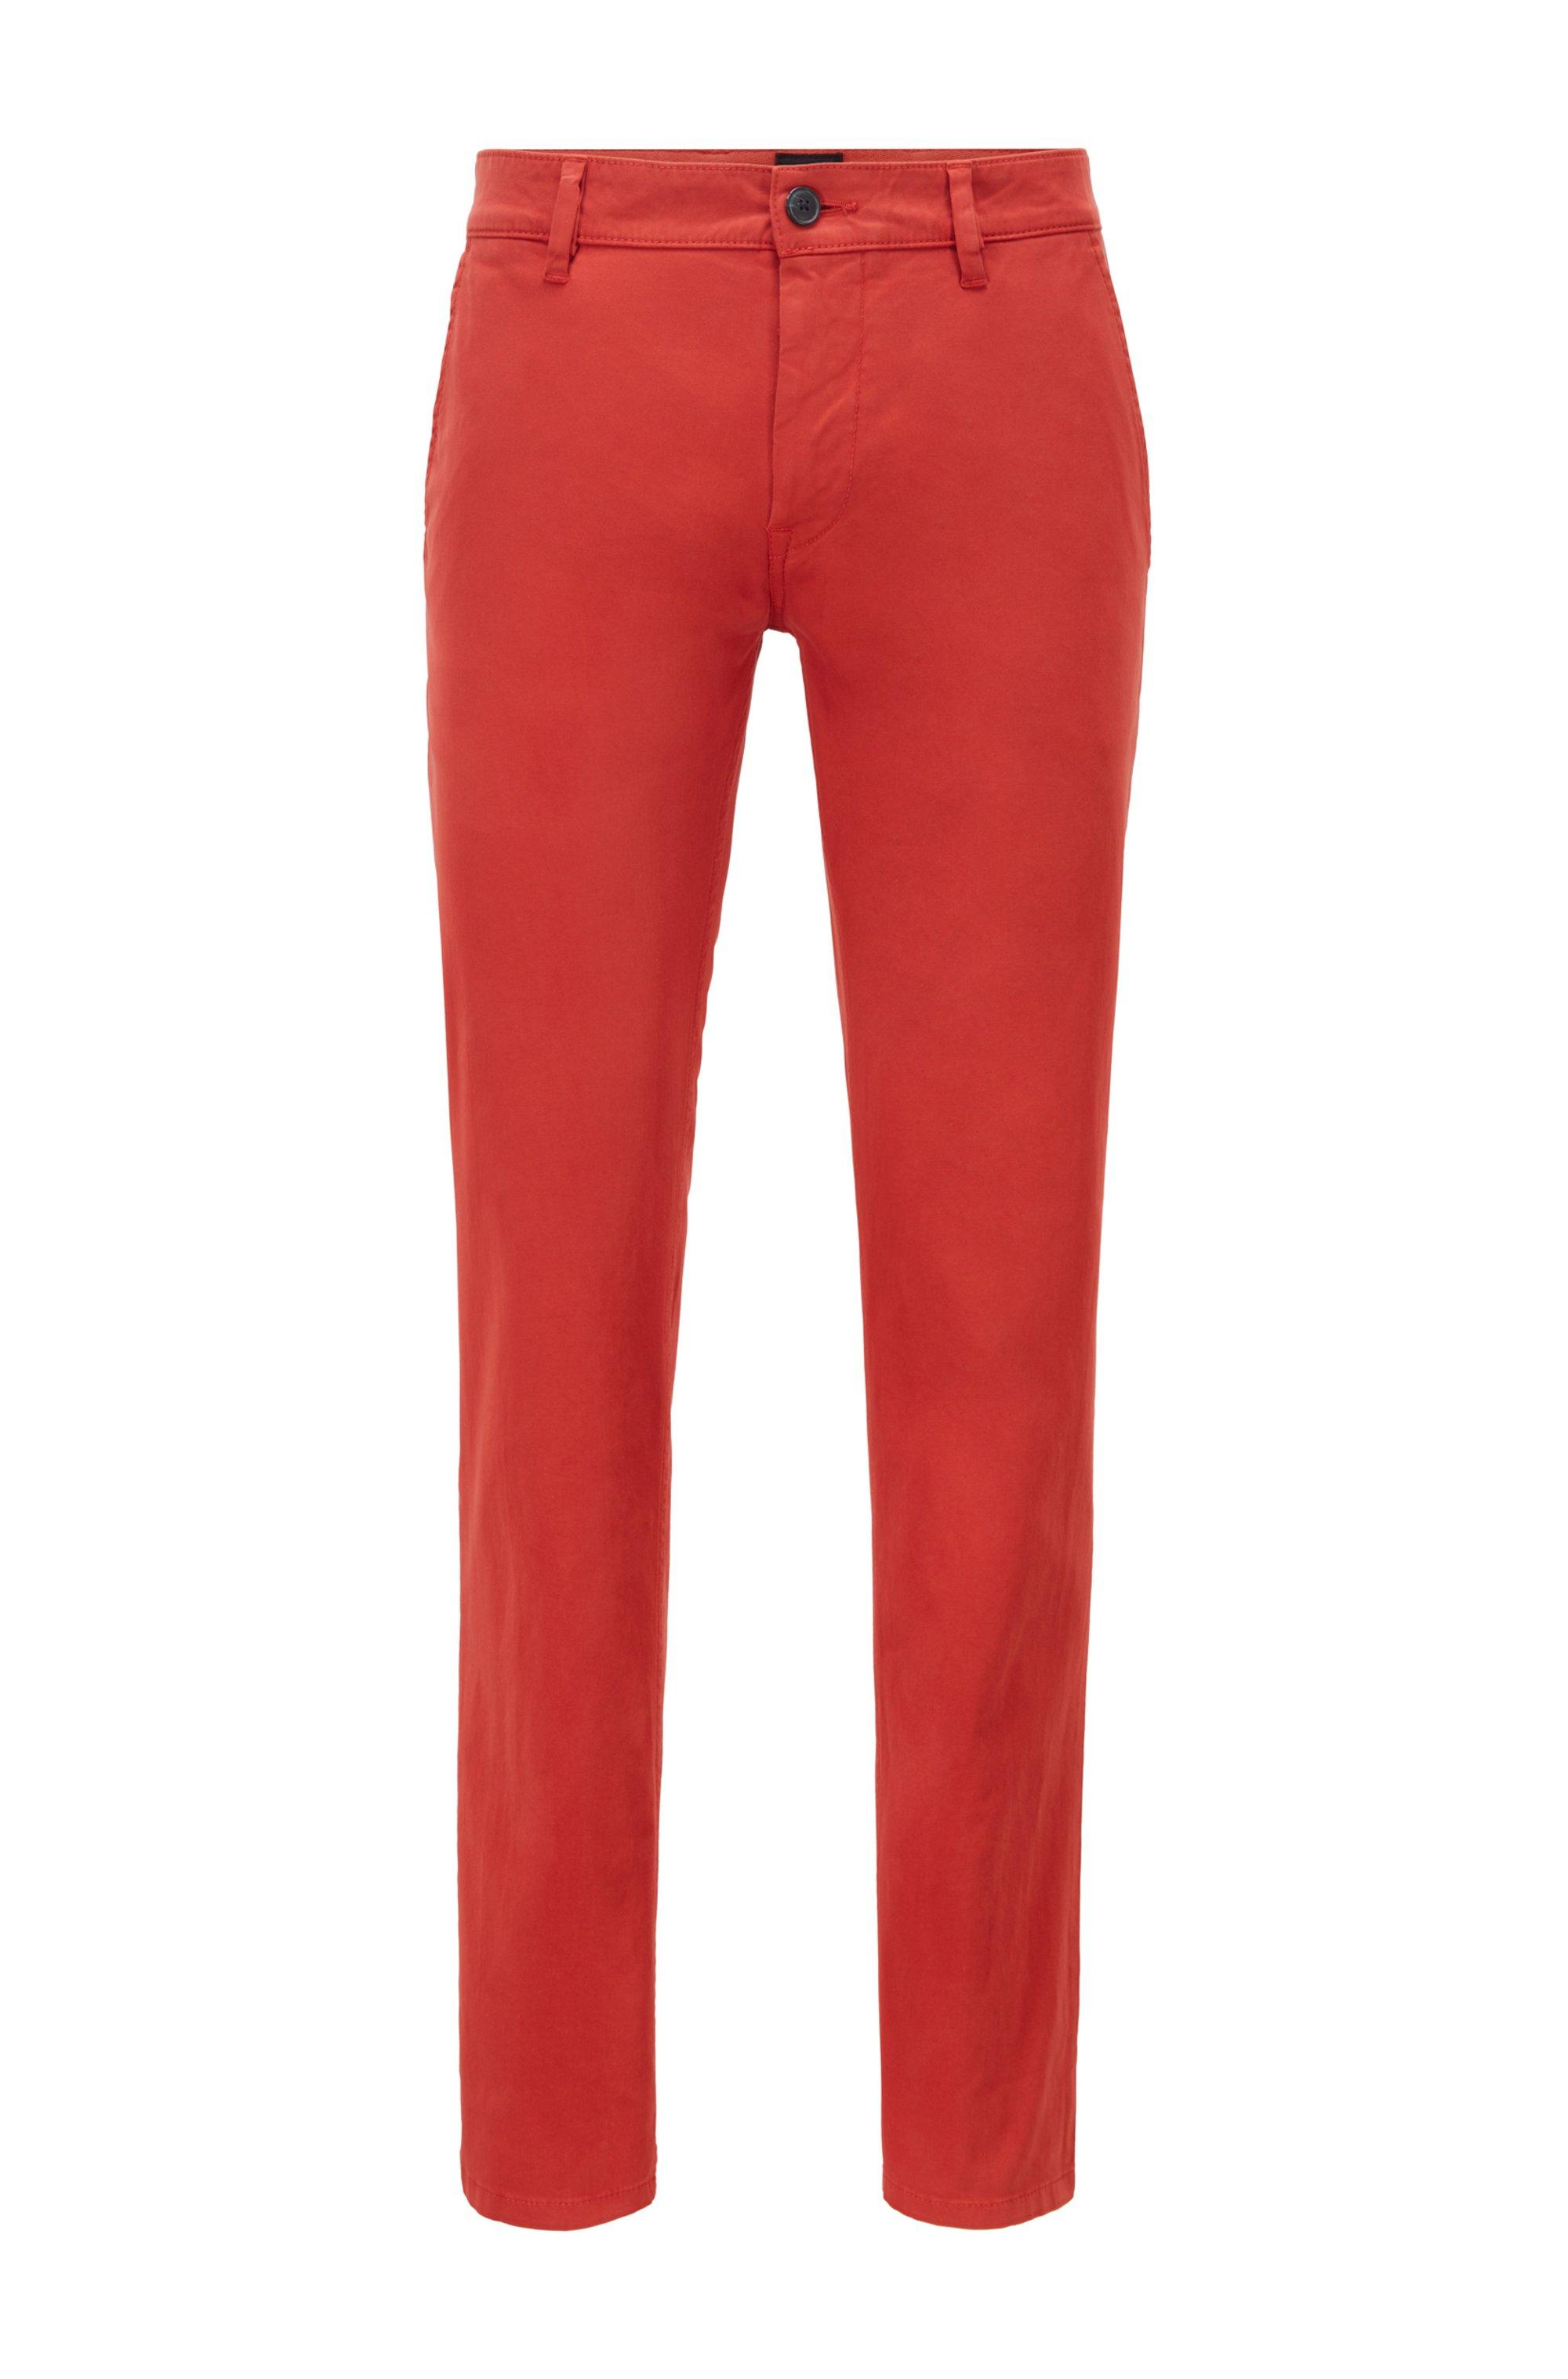 Chino casual Slim Fit en coton stretch brossé, Rouge